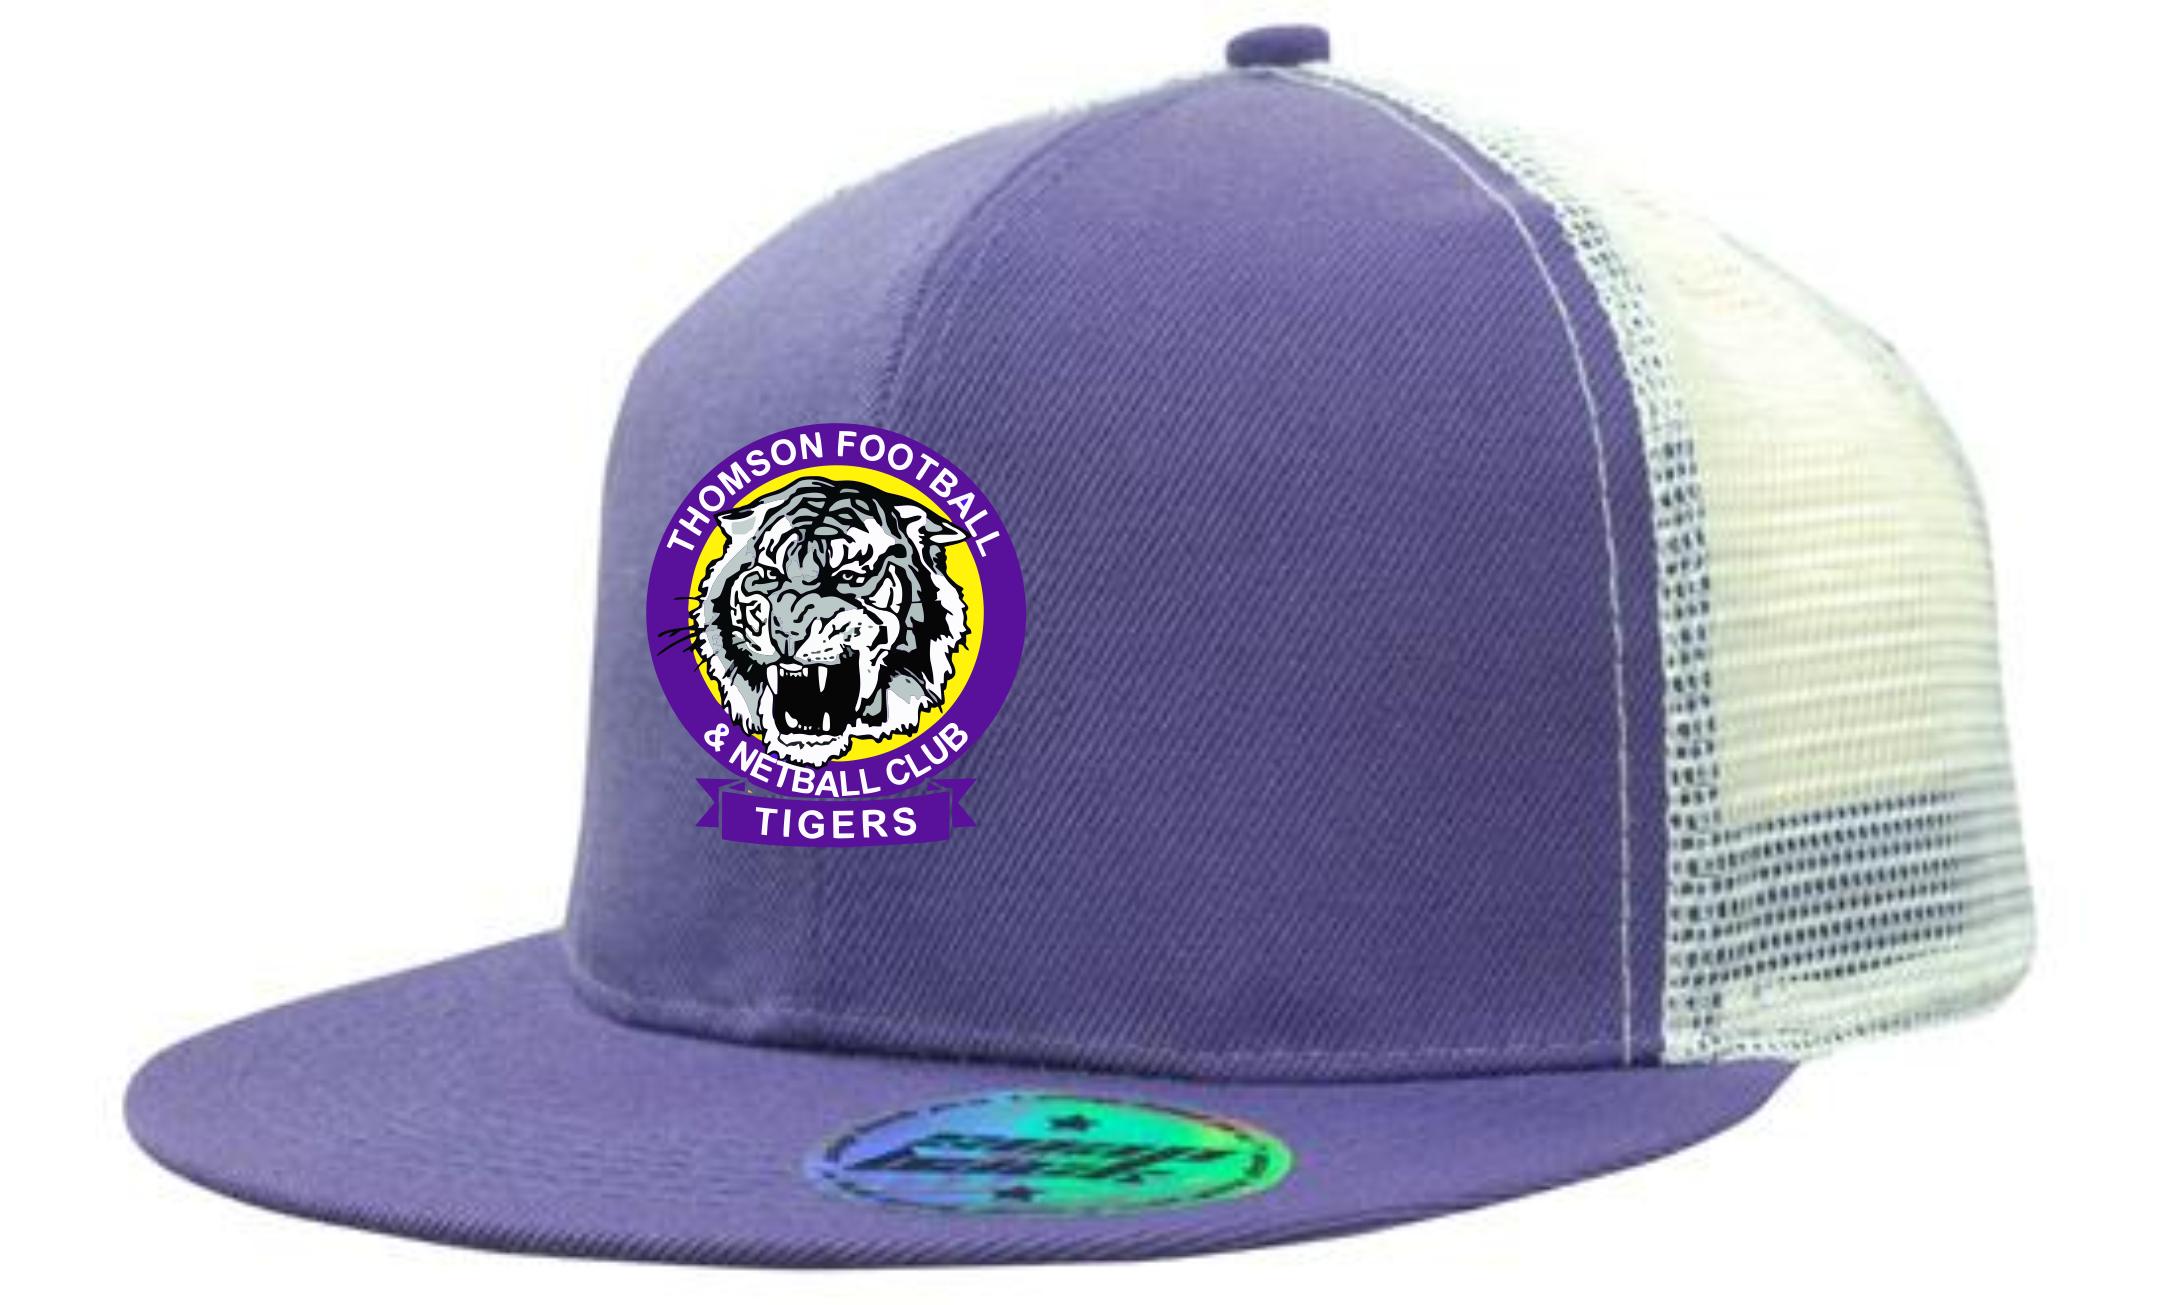 Flat Peak Club Cap with snap back